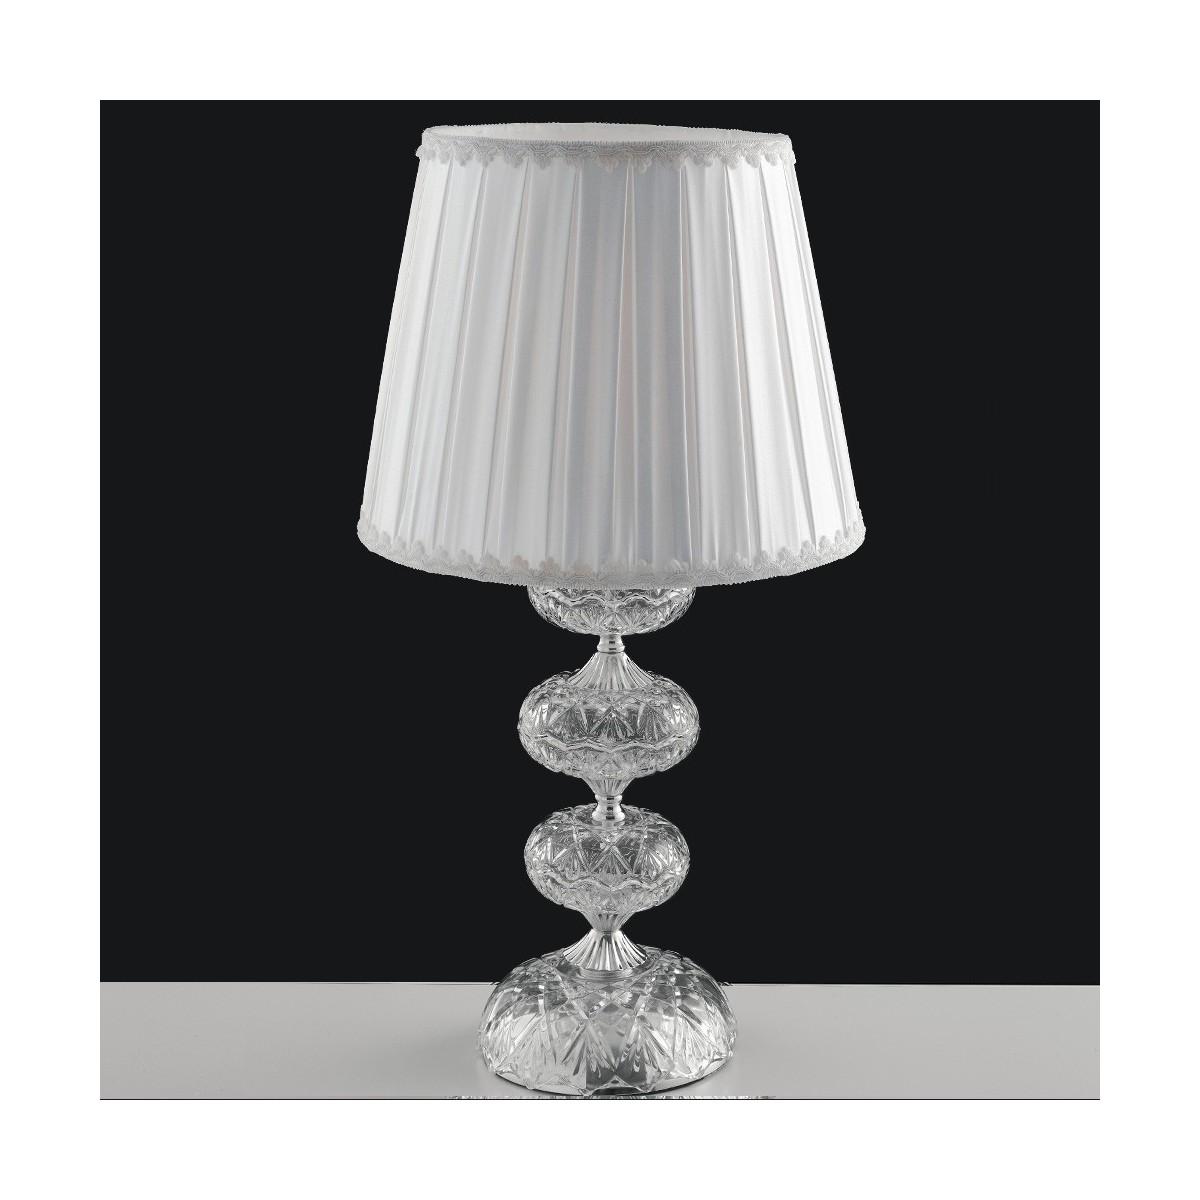 I incanto lg1 8031440363983 fan europe lighting abat jour for Lampade da mobile